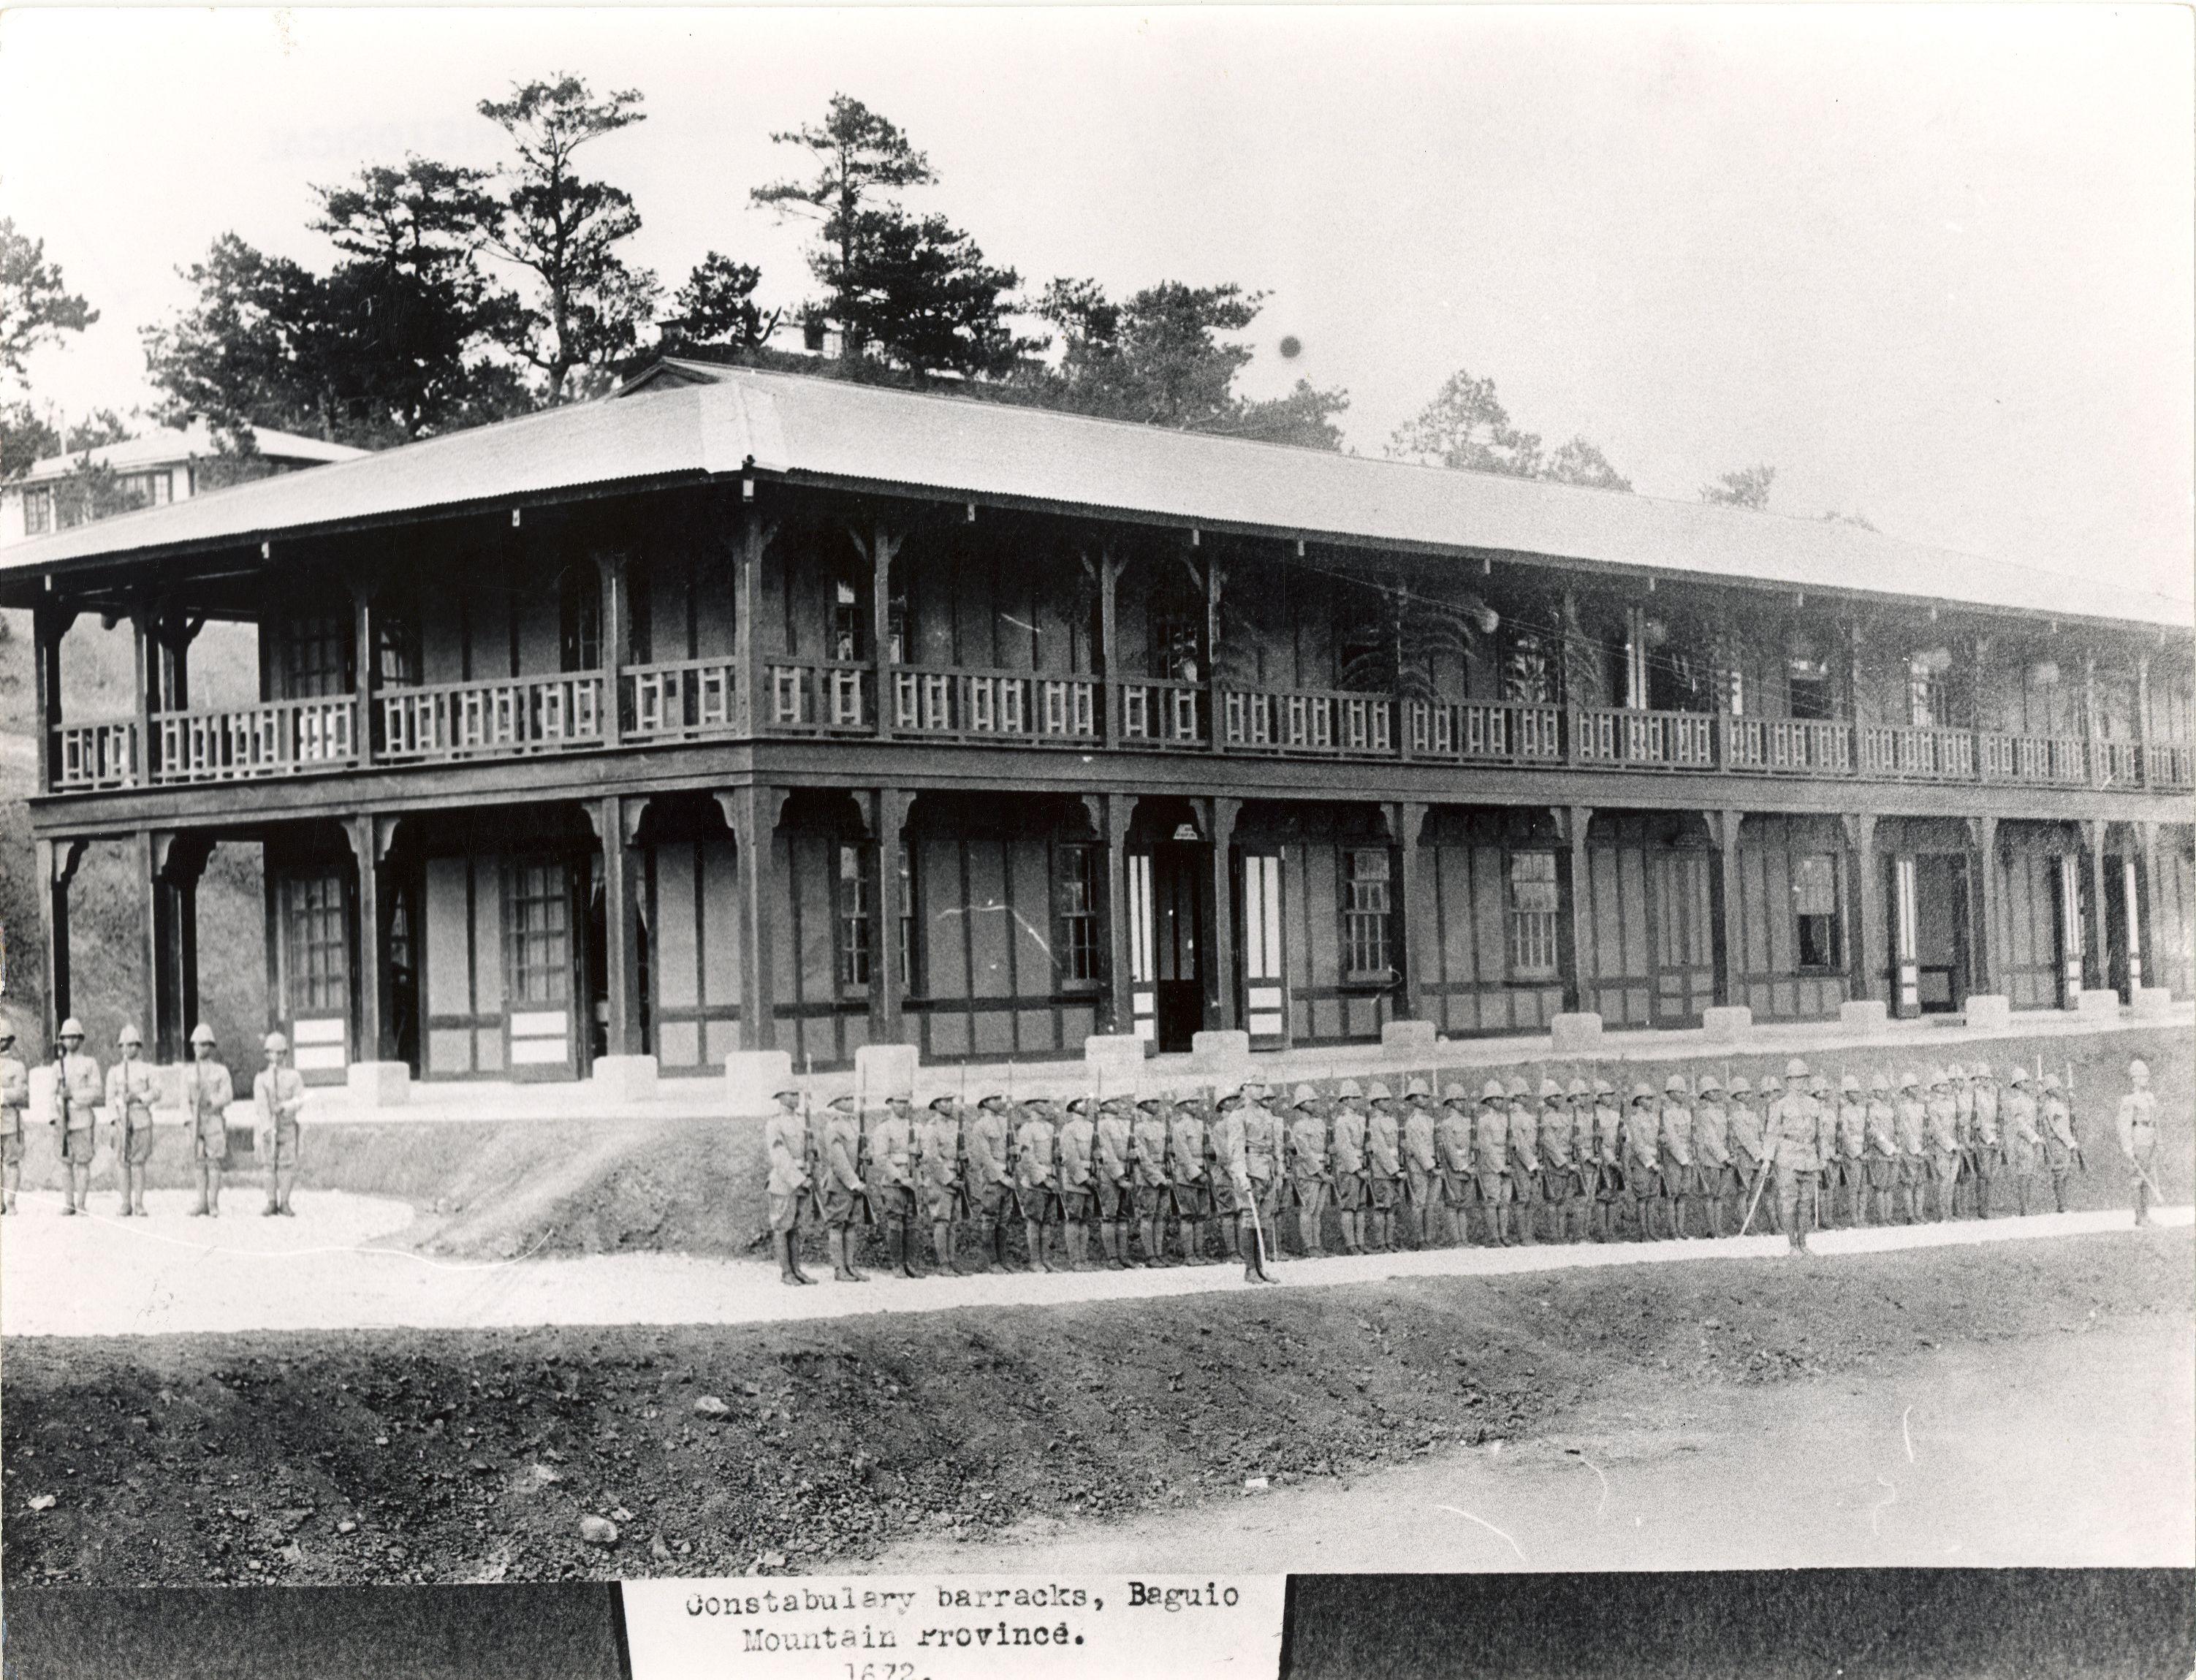 The Constabulary Barracks, Baguio, Mountain Provinces